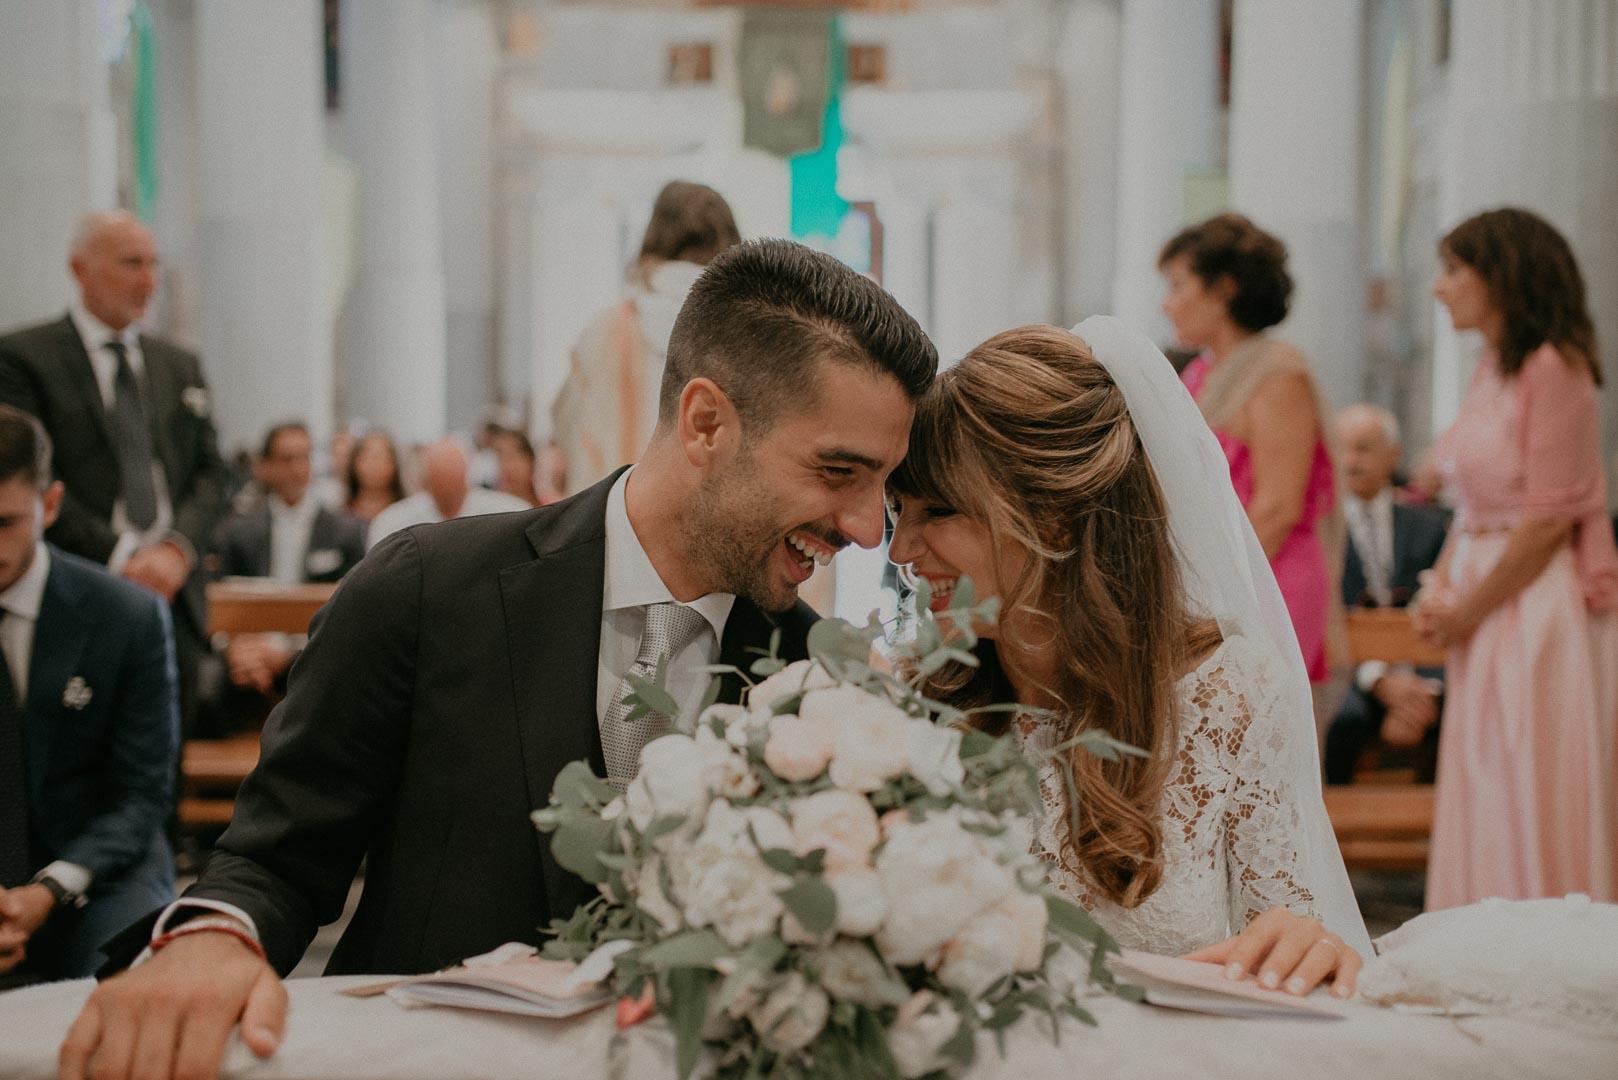 wedding-photographer-destination-fineart-bespoke-reportage-napoli-nabilah-vivianeizzo-spazio46-74